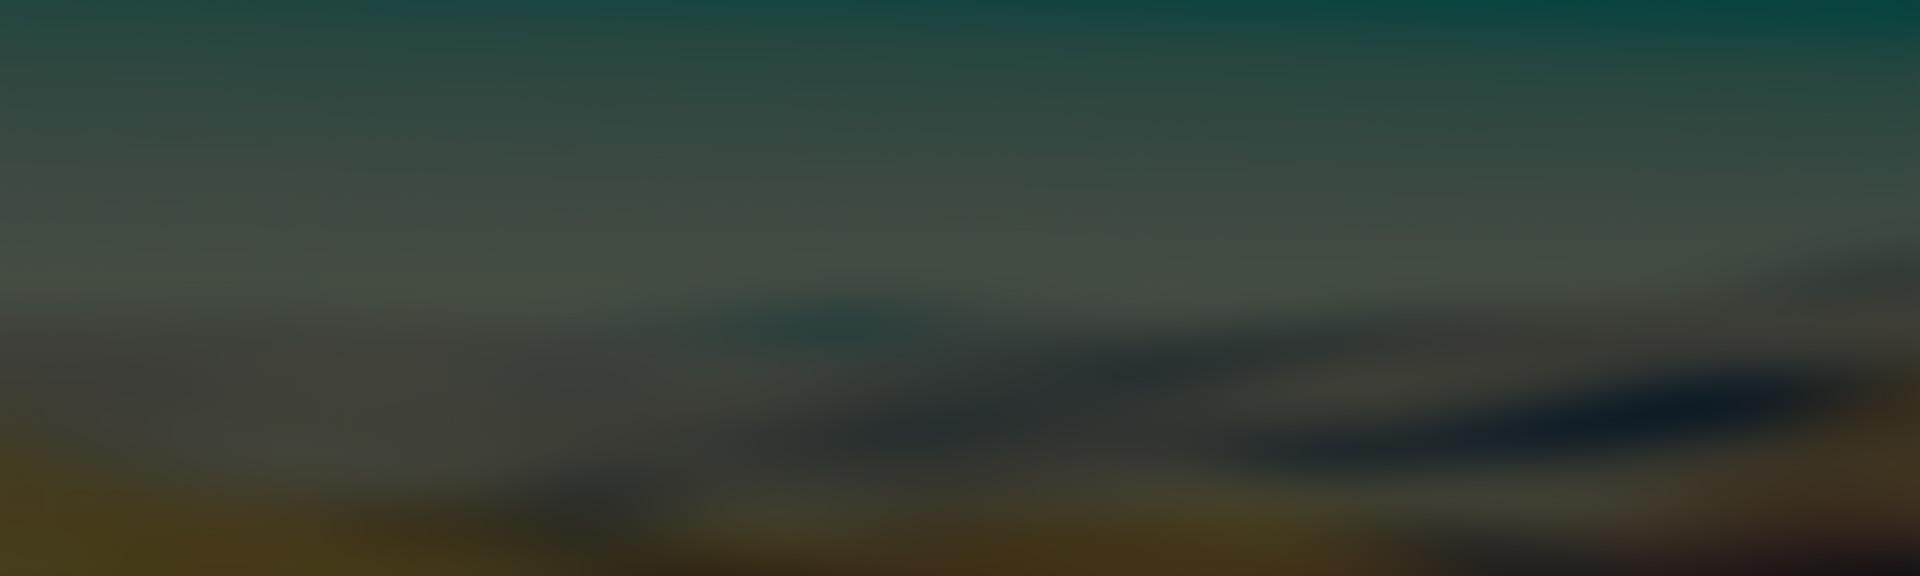 sazzi_full-width_bkg_dark